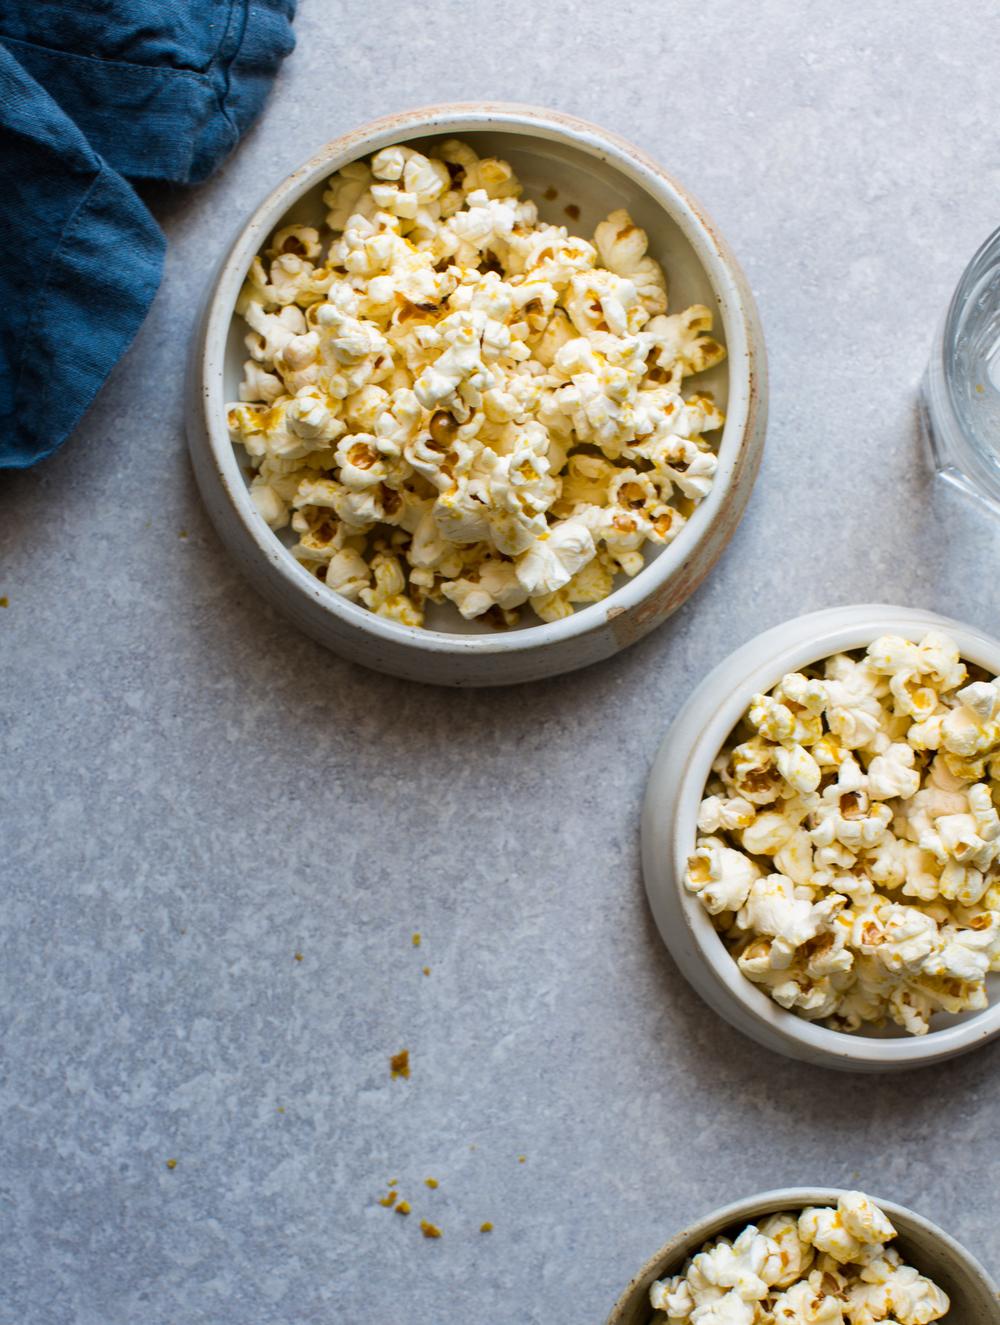 Cheesy-Popcorn | www.8thandlake.com